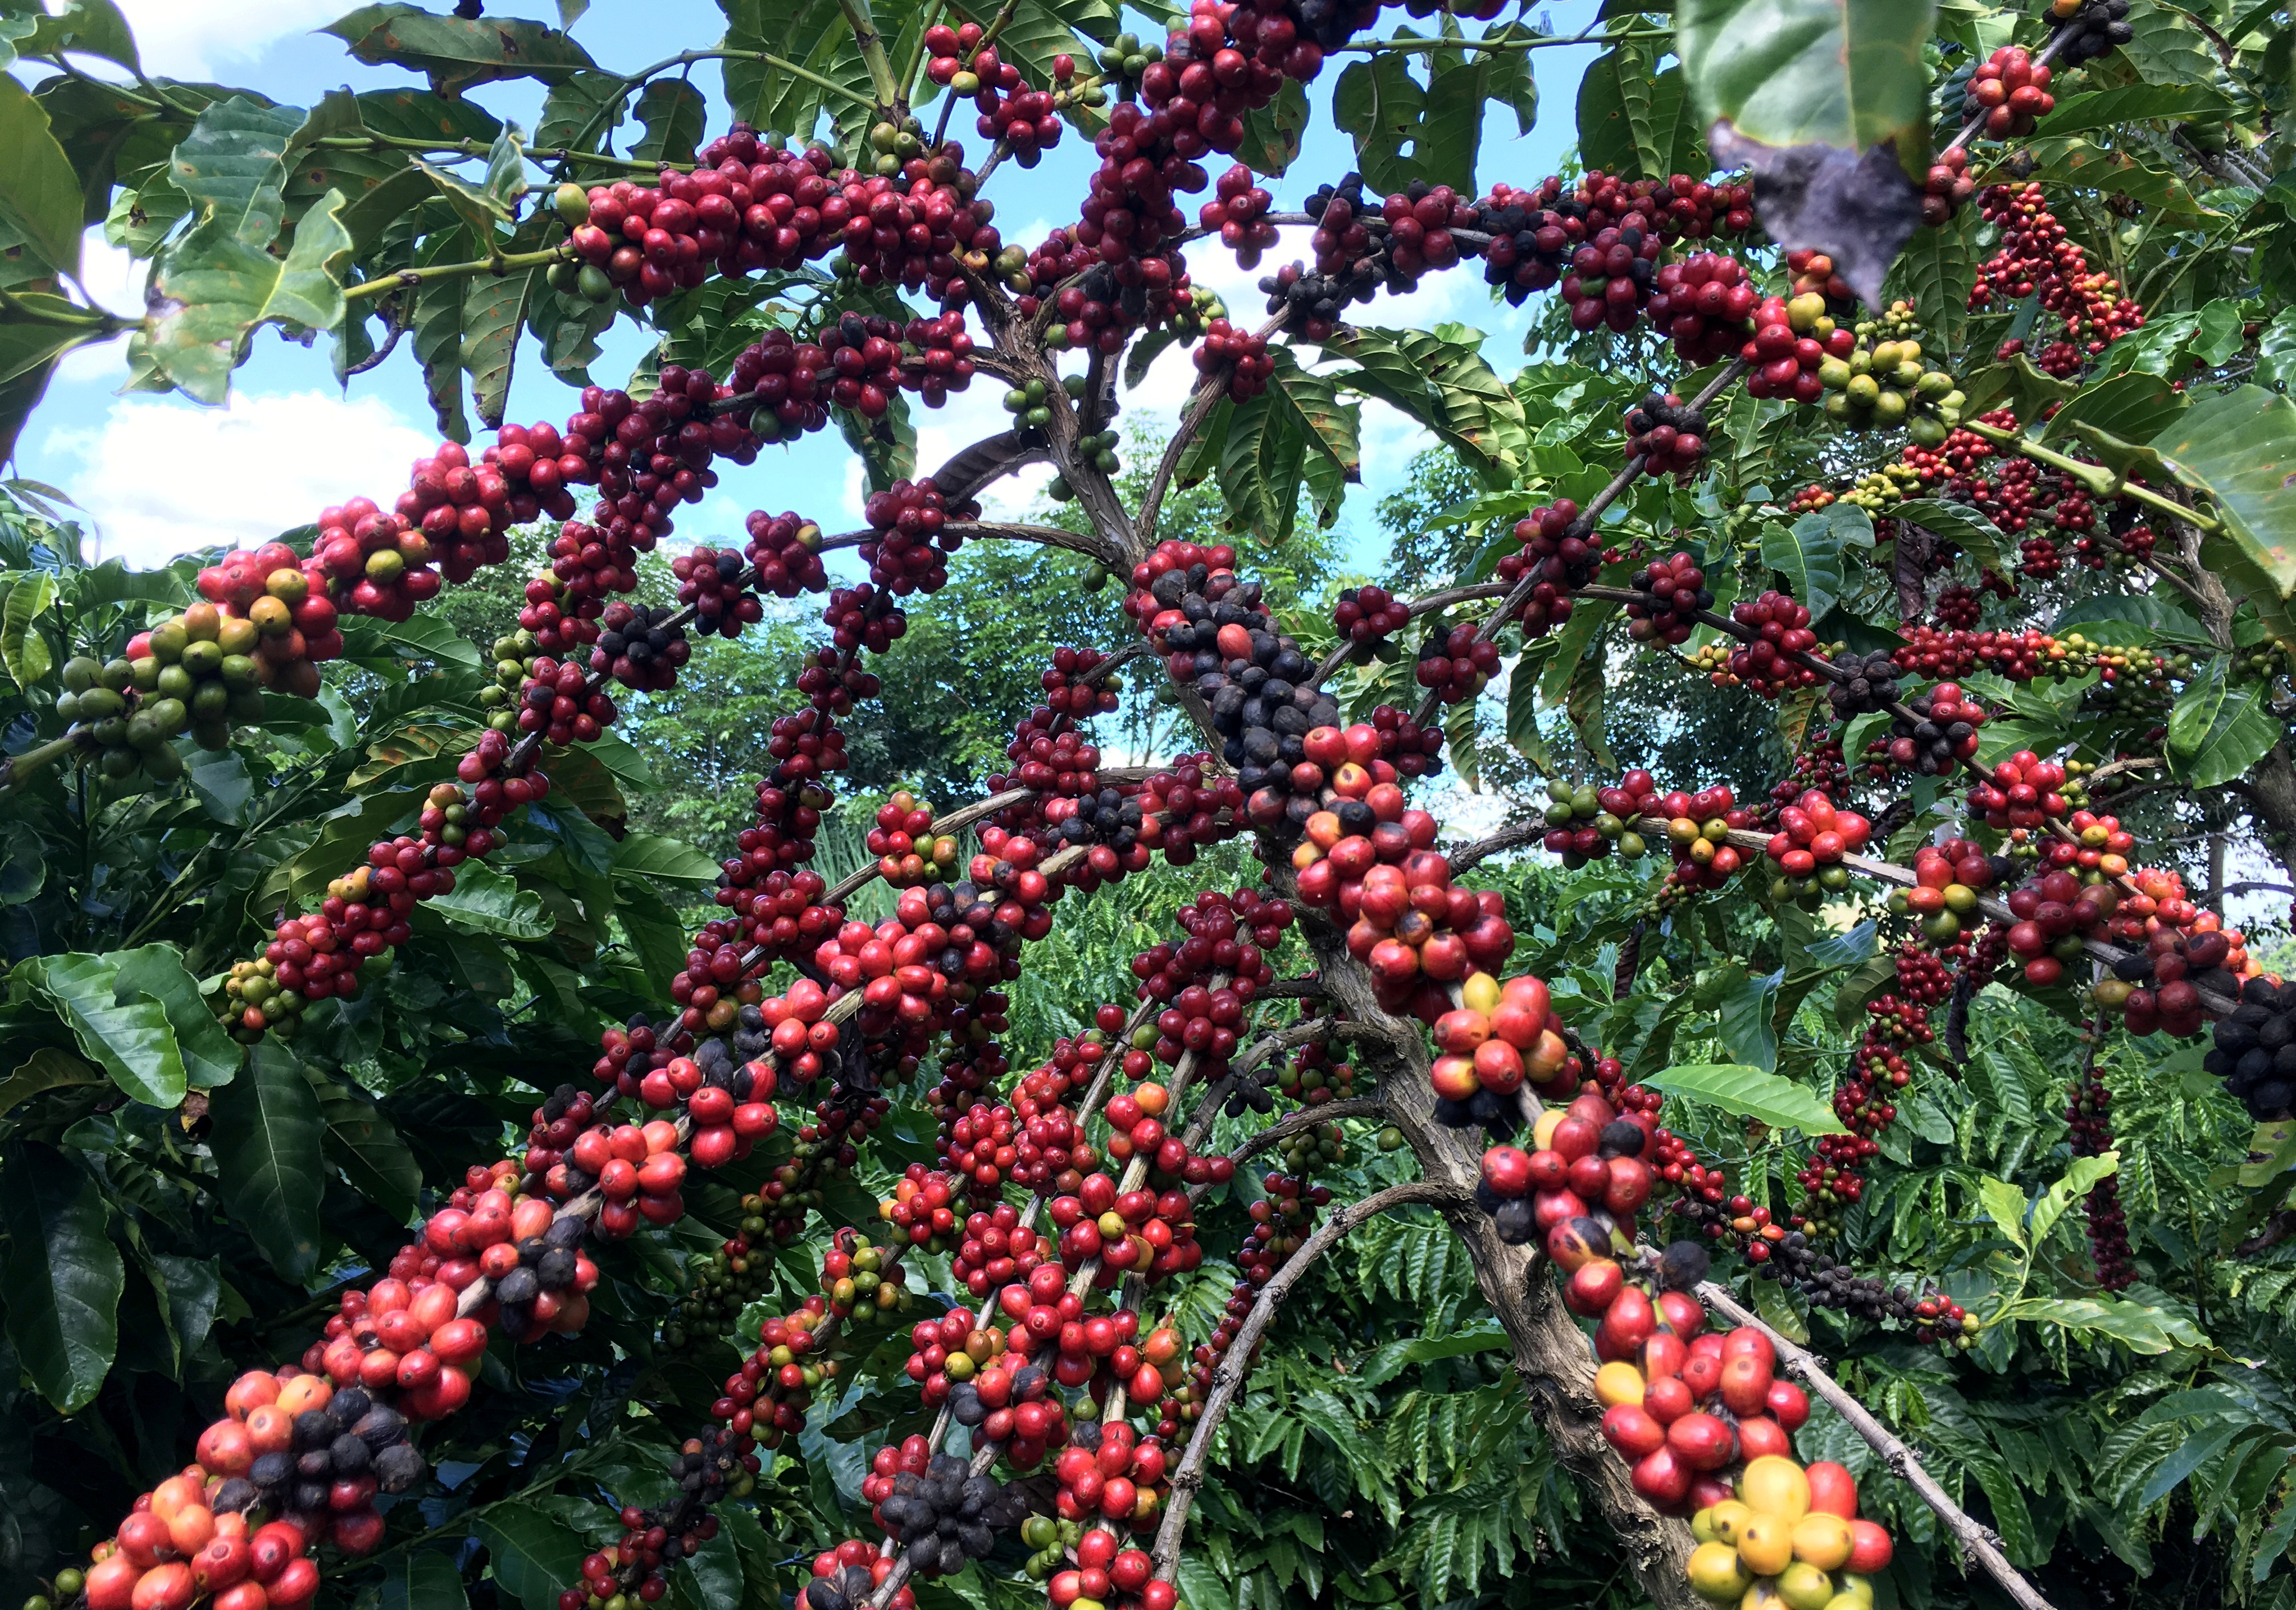 The robusta coffee fruits are seen in Sao Gabriel da Palha, Espirito Santo state, Brazil May 2, 2018. Picture taken May 2, 2018. REUTERS/Jose Roberto Gomes